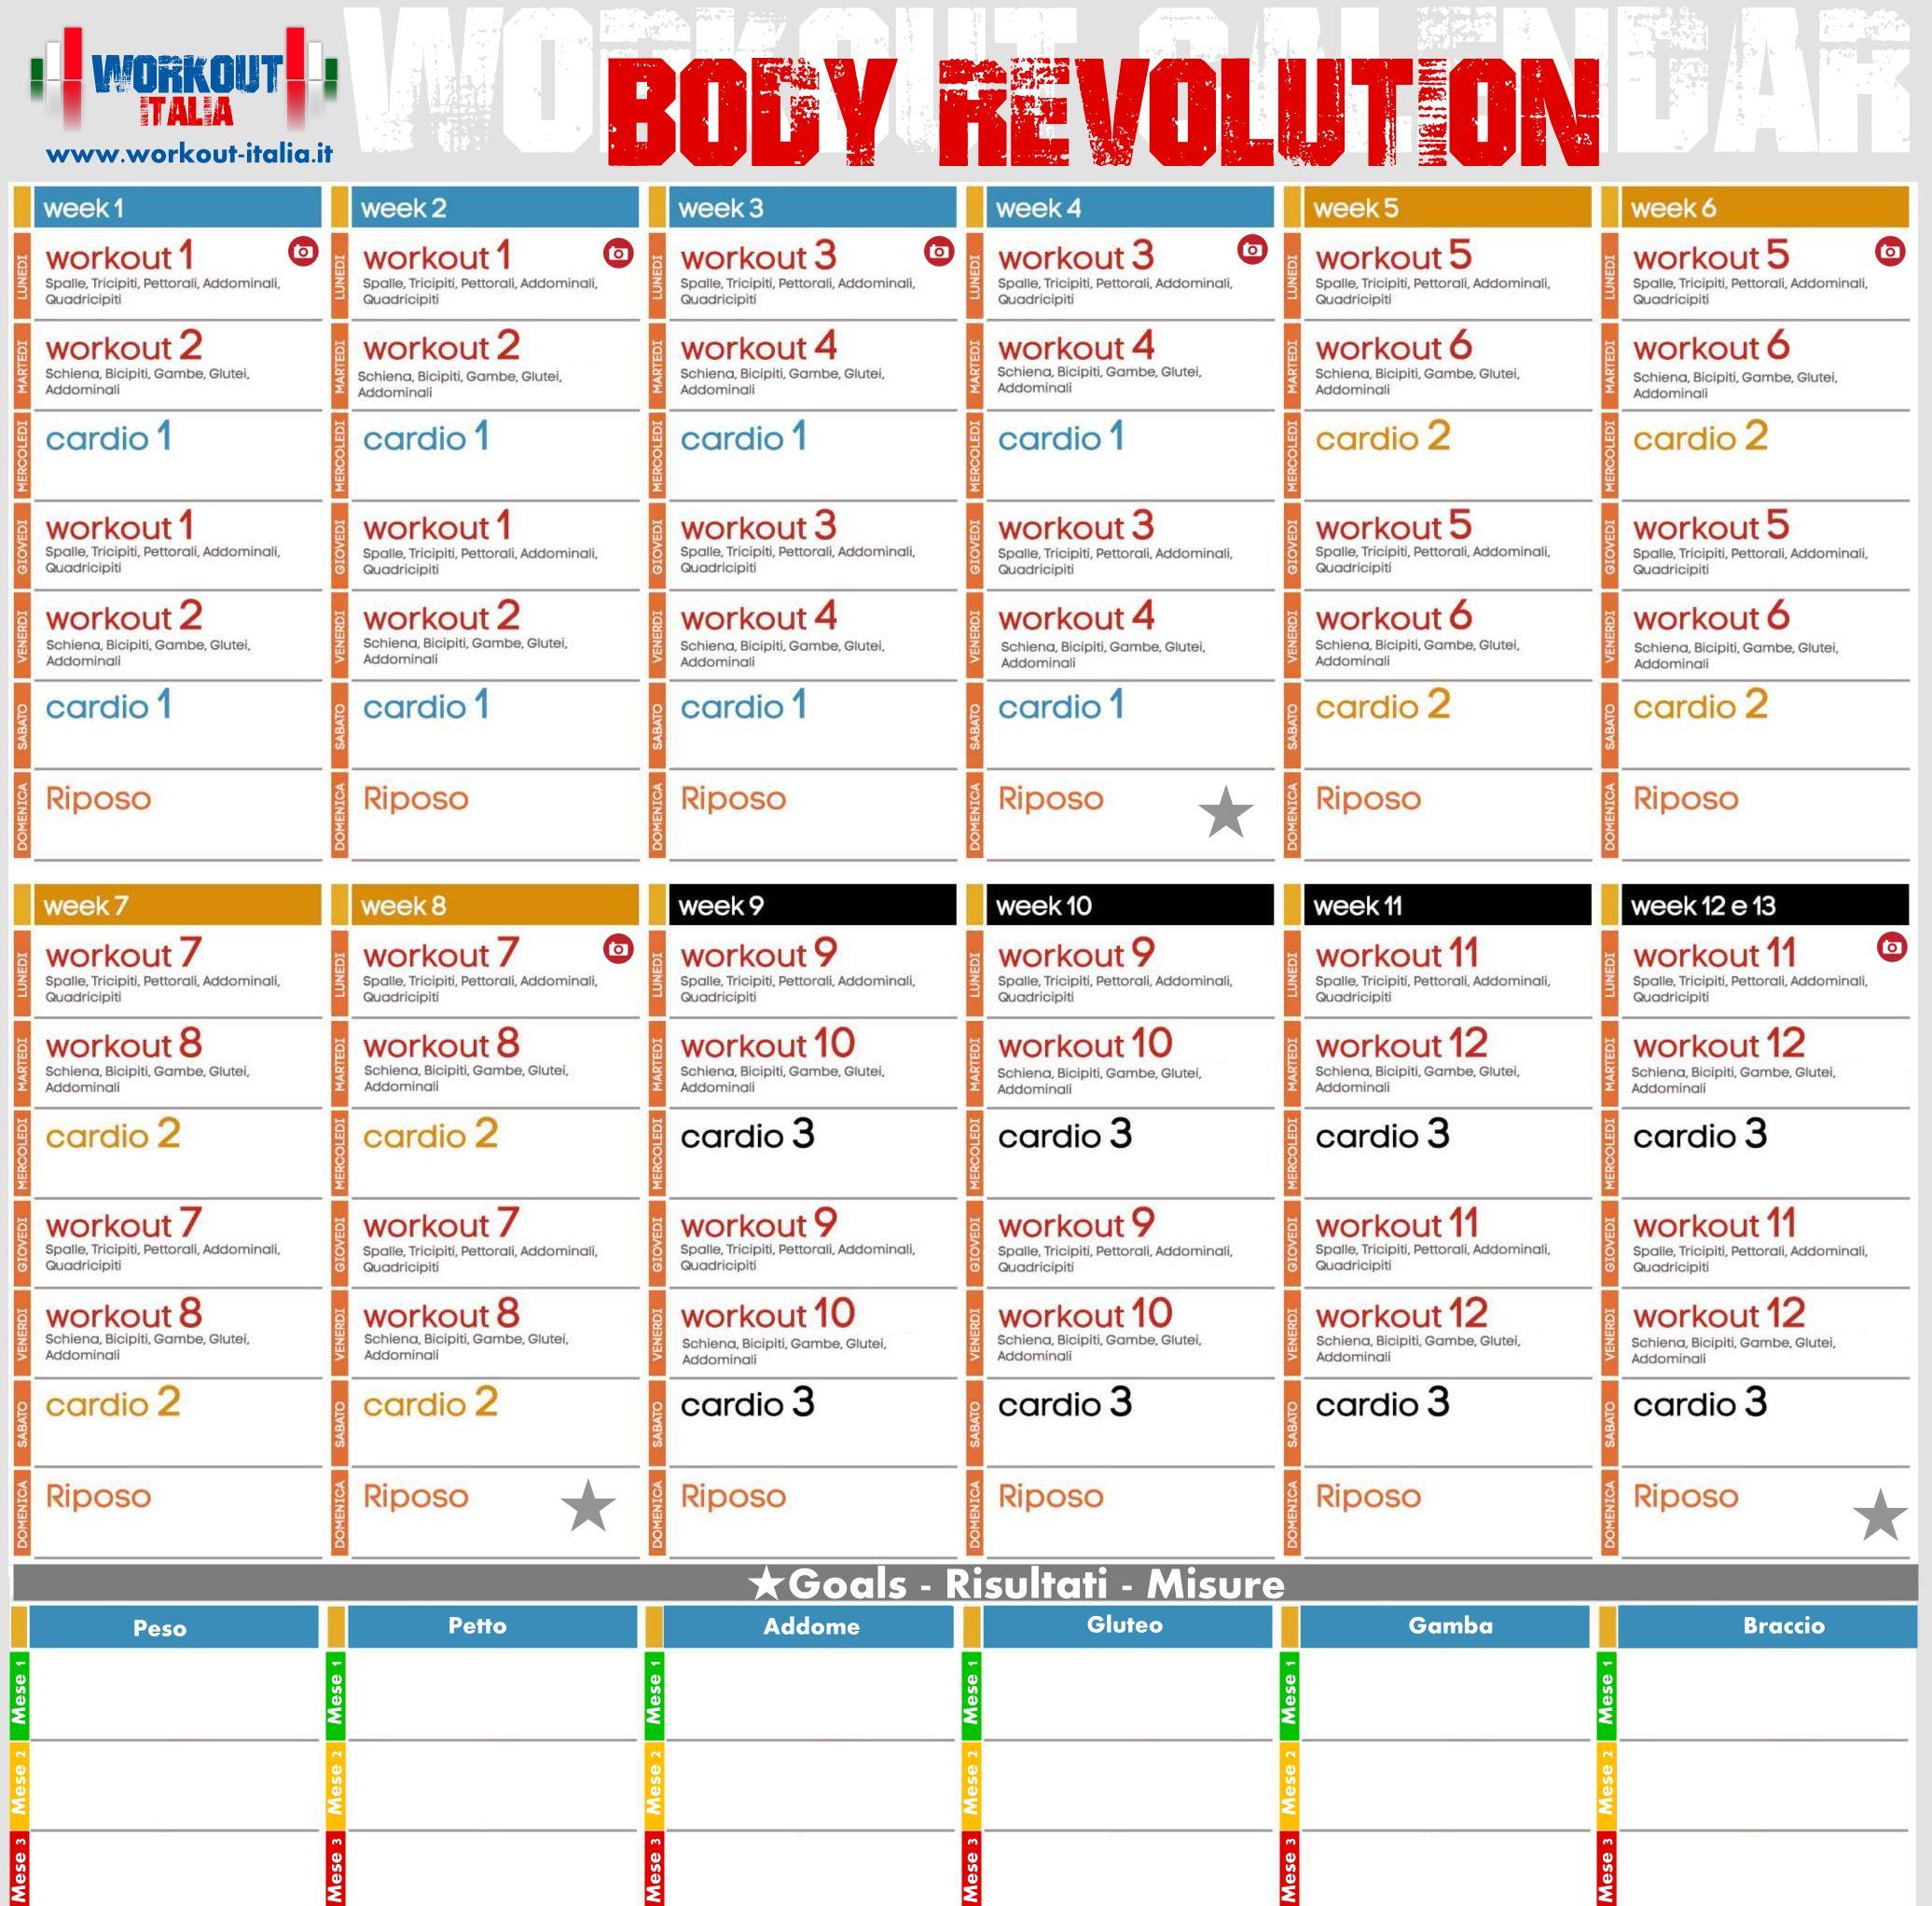 body-revolution-calendar